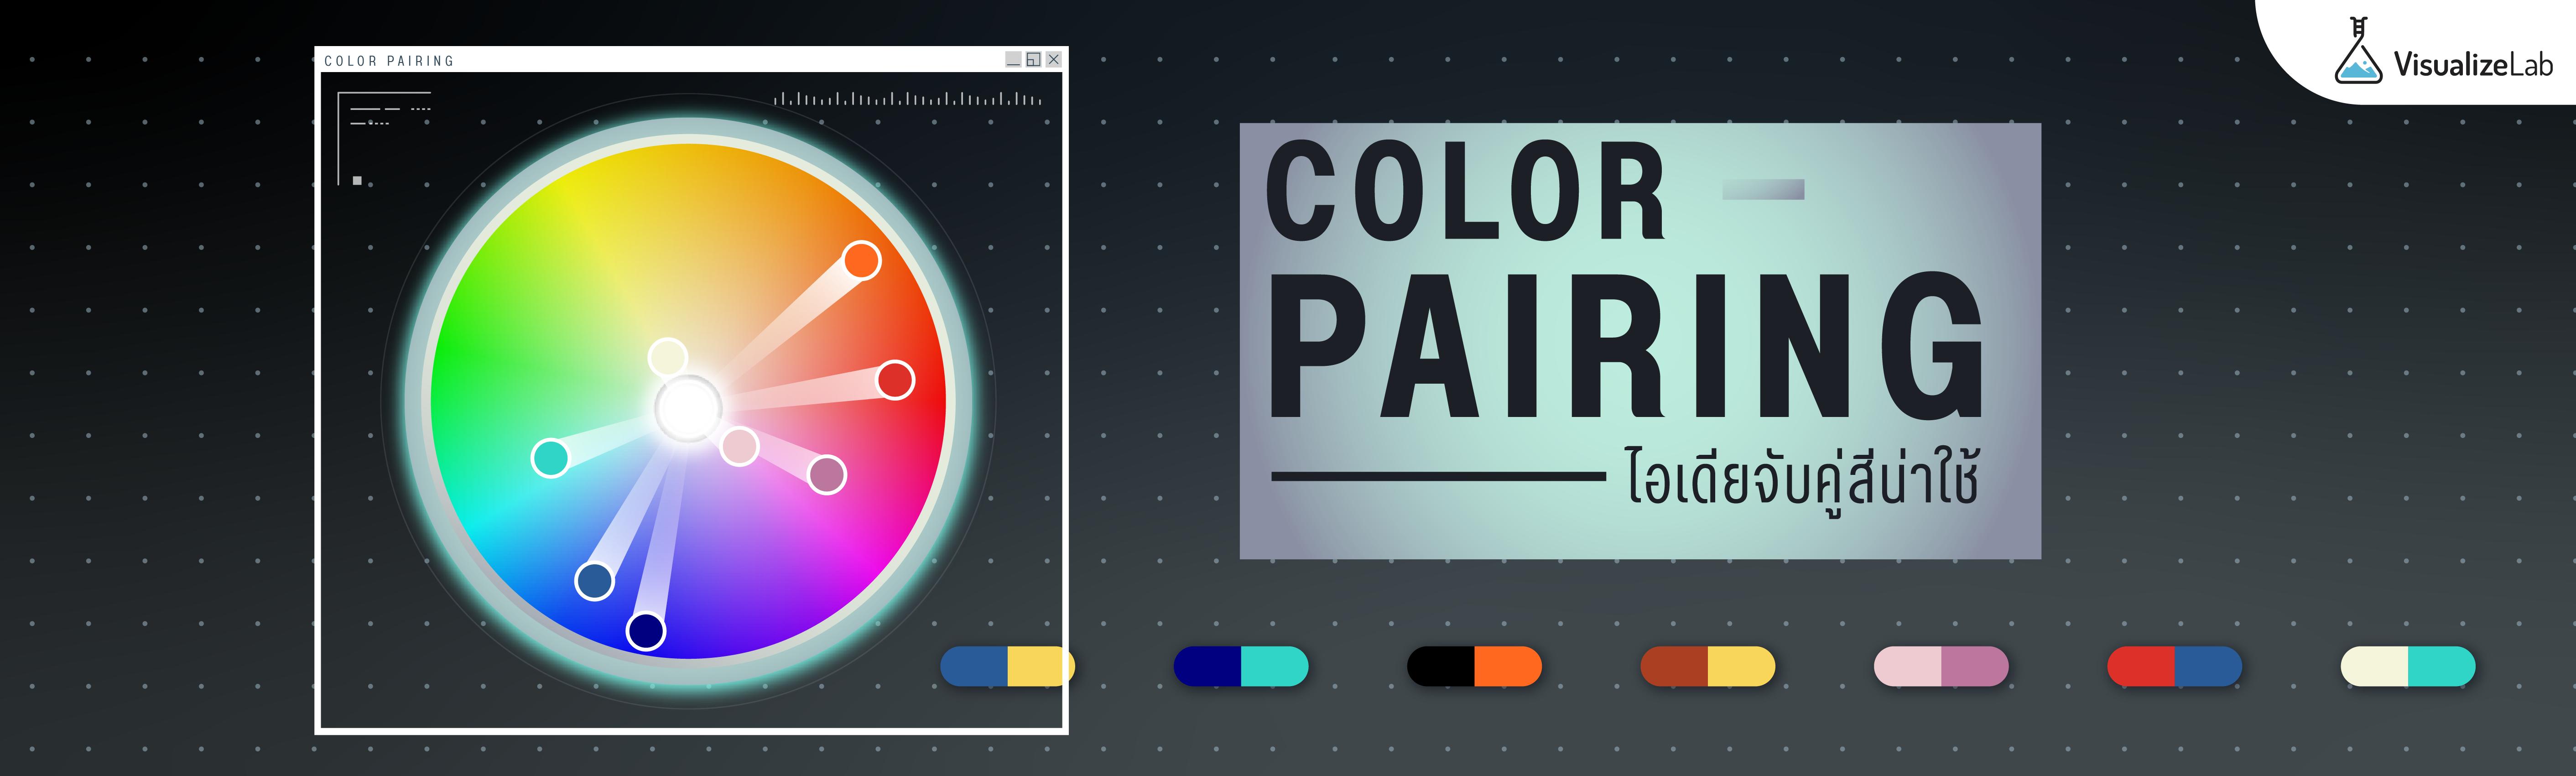 ColorPairing-02